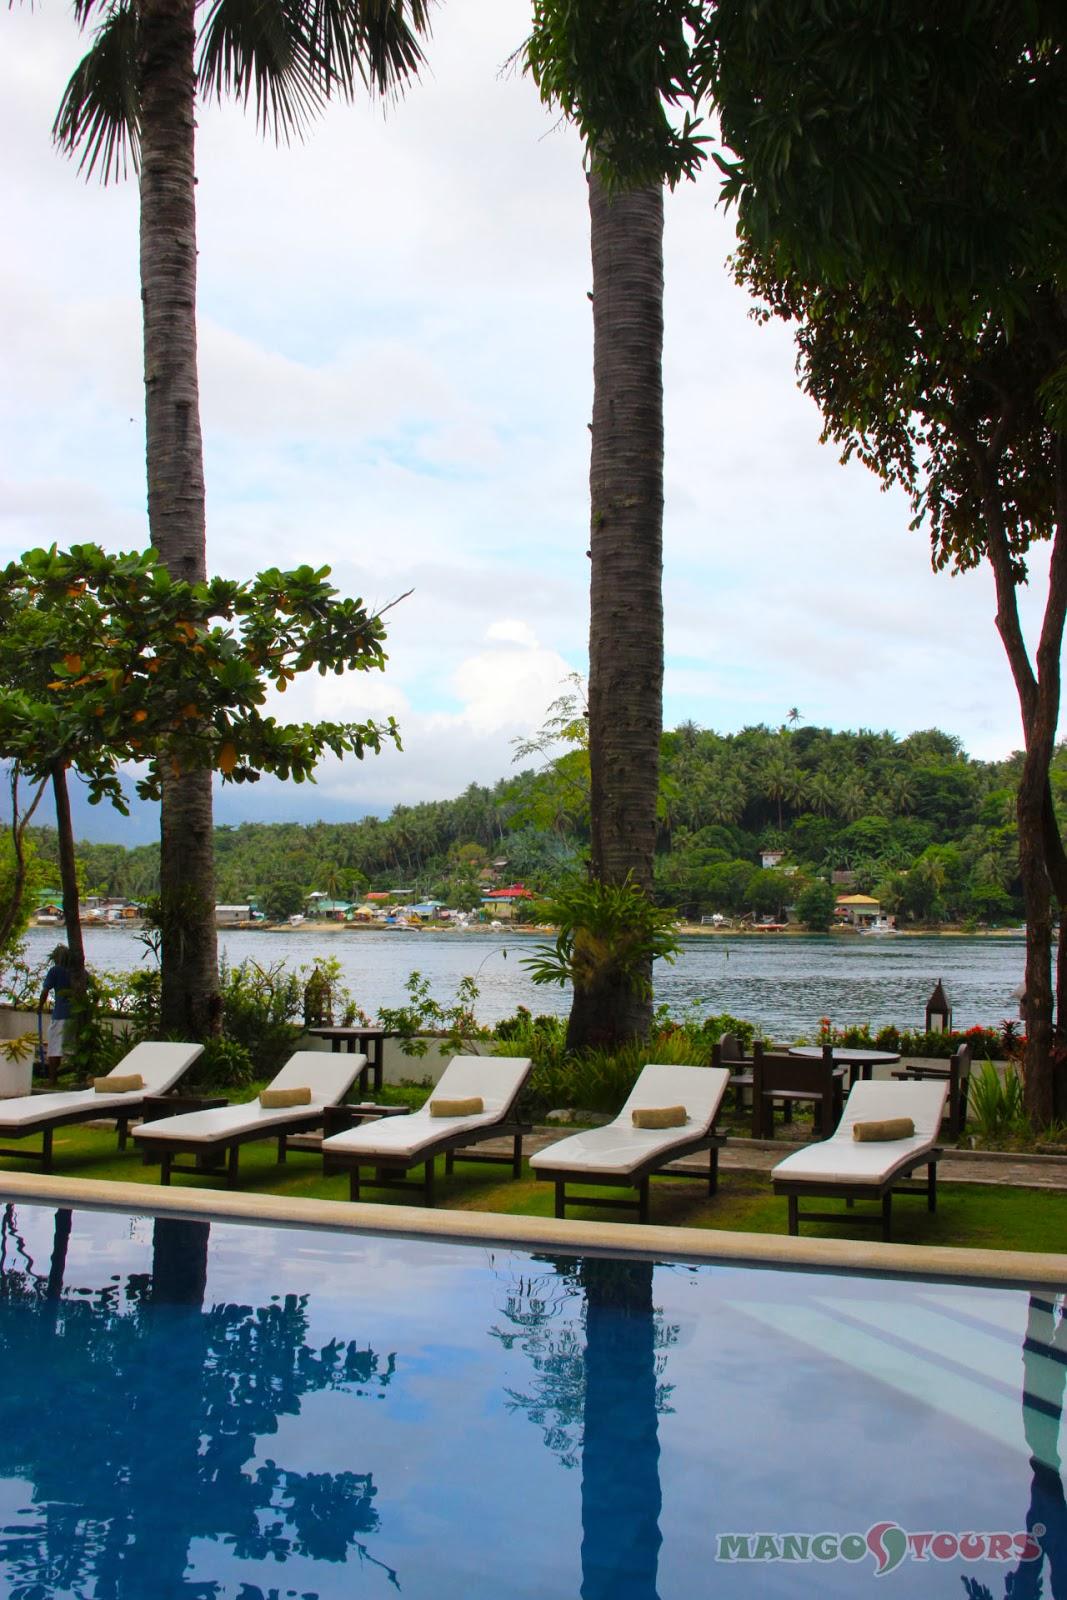 Puerto Galera Buri Resort & Spa Mango Tours Philippines pool side